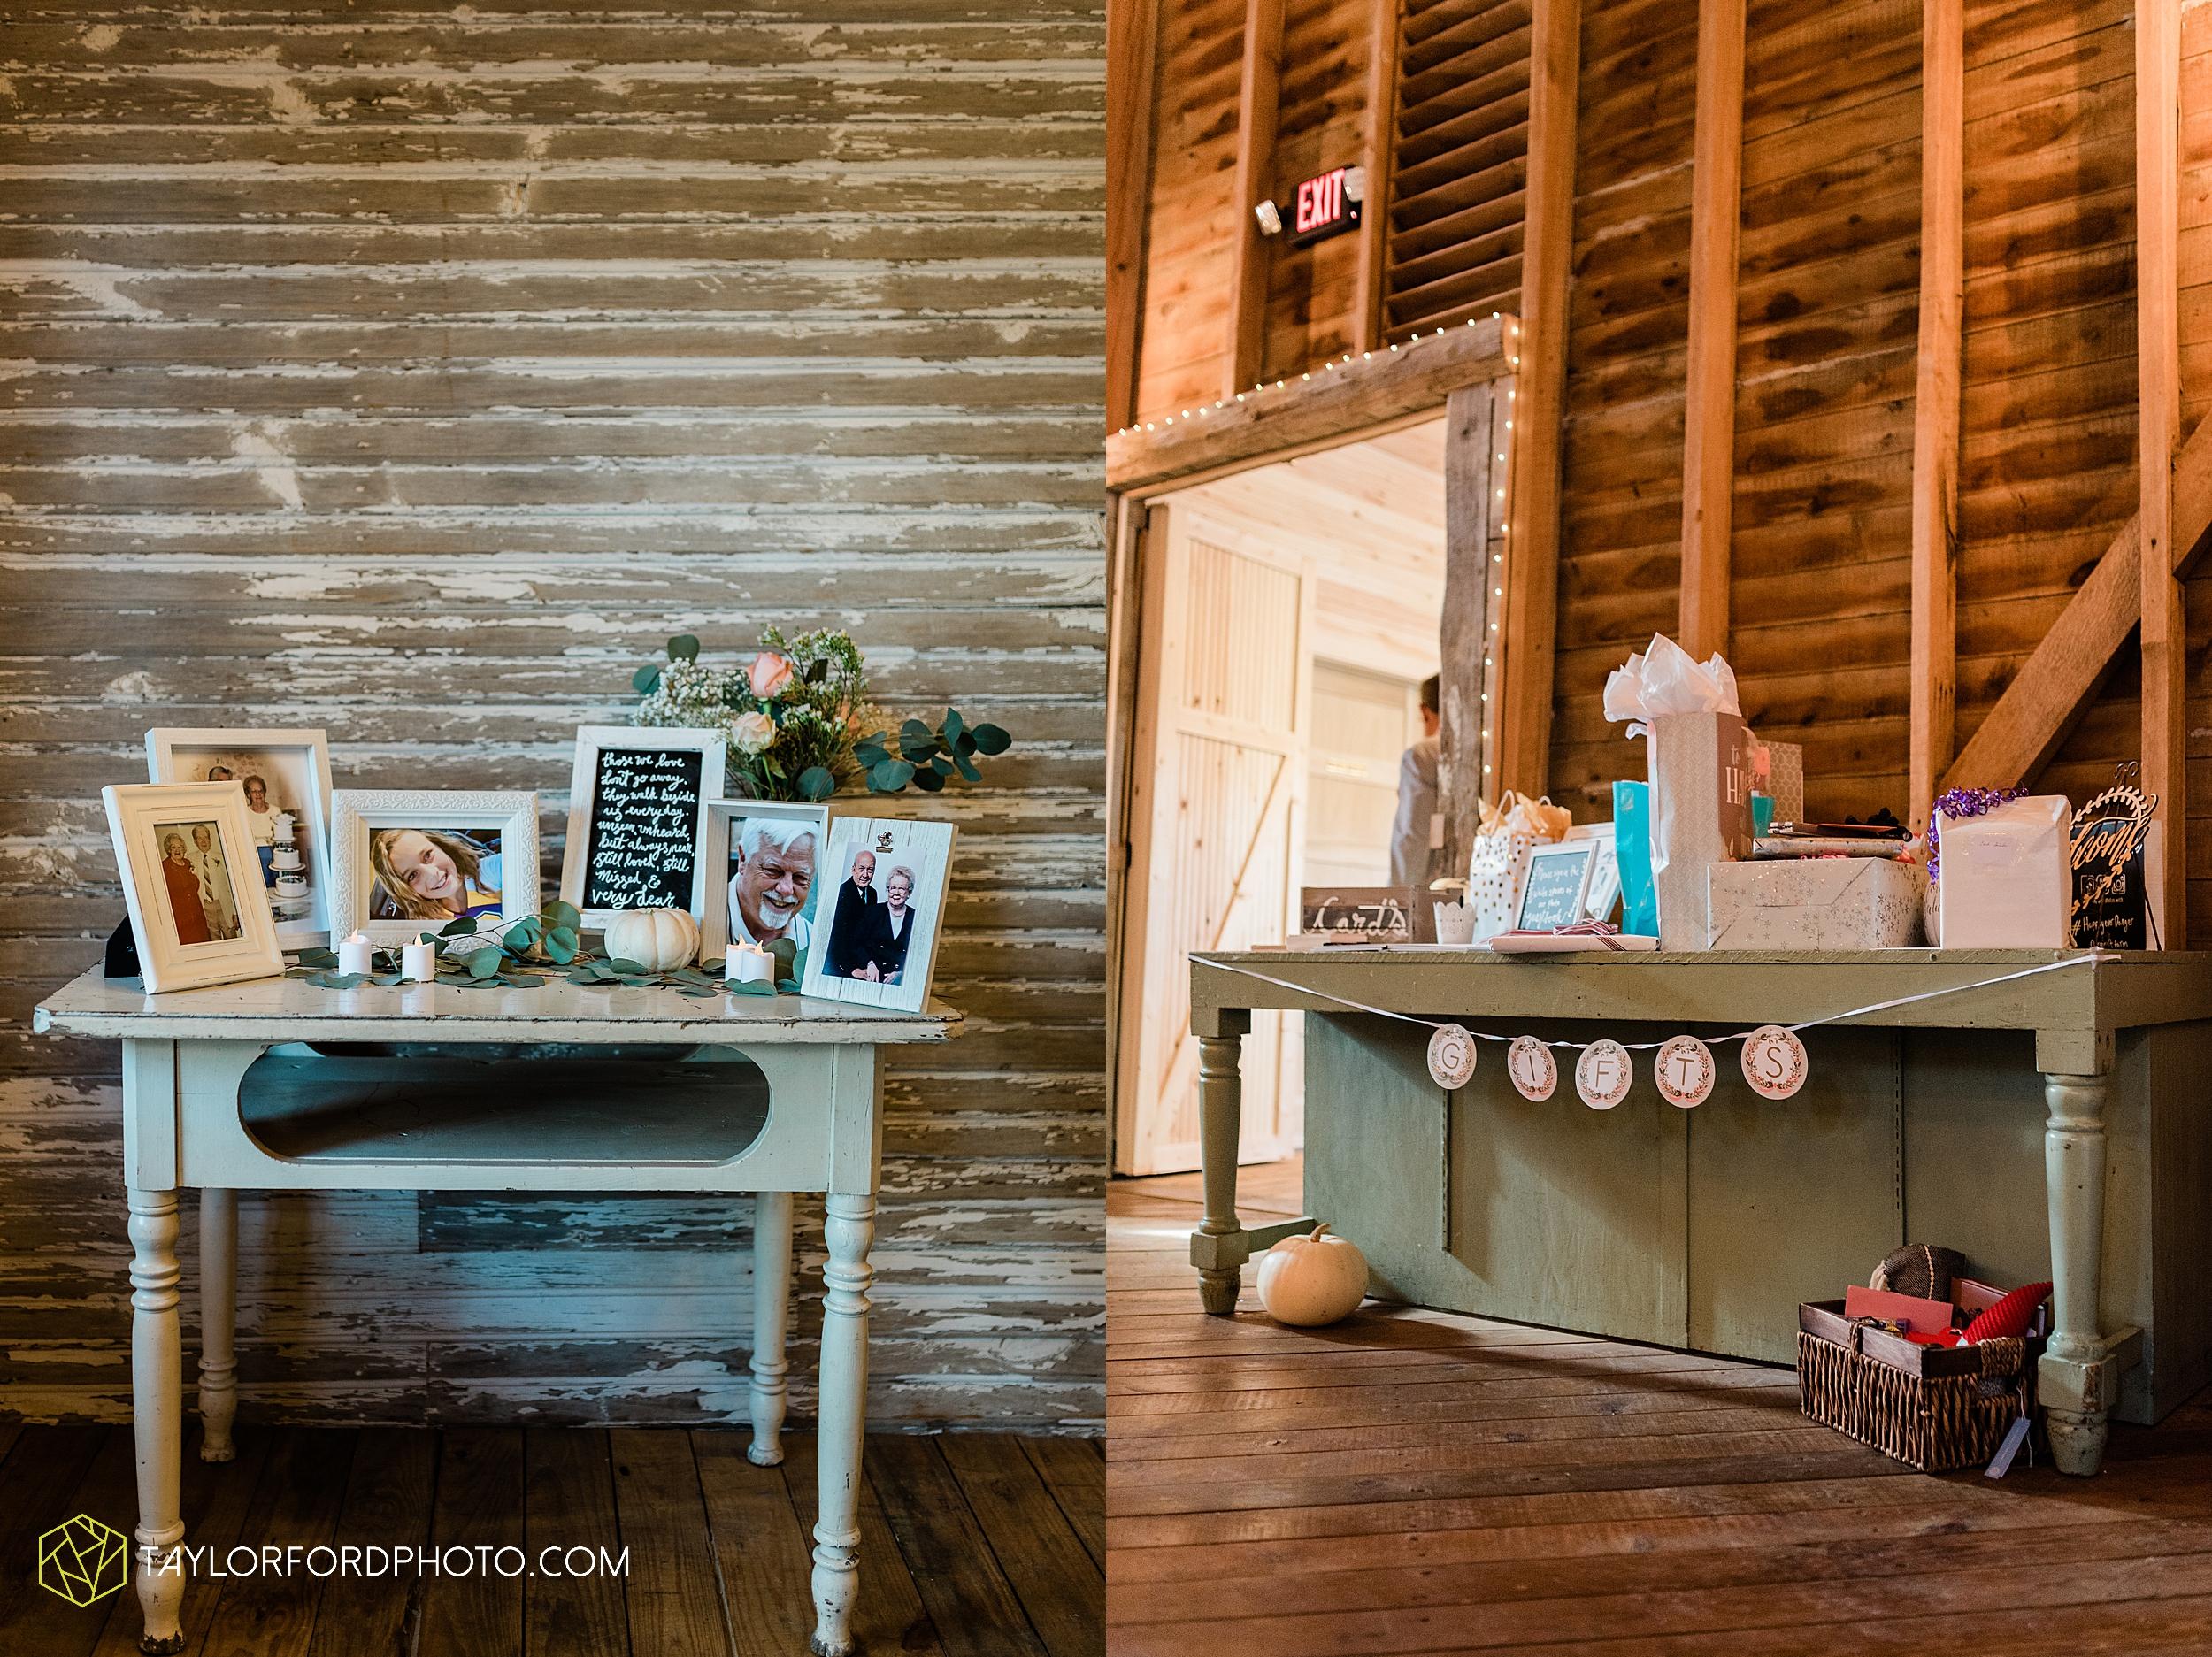 marissa-nicole-nick-daeger-orrmont-estate-farm-wedding-piqua-dayton-troy-ohio-fall-photographer-taylor-ford-photography_1518.jpg